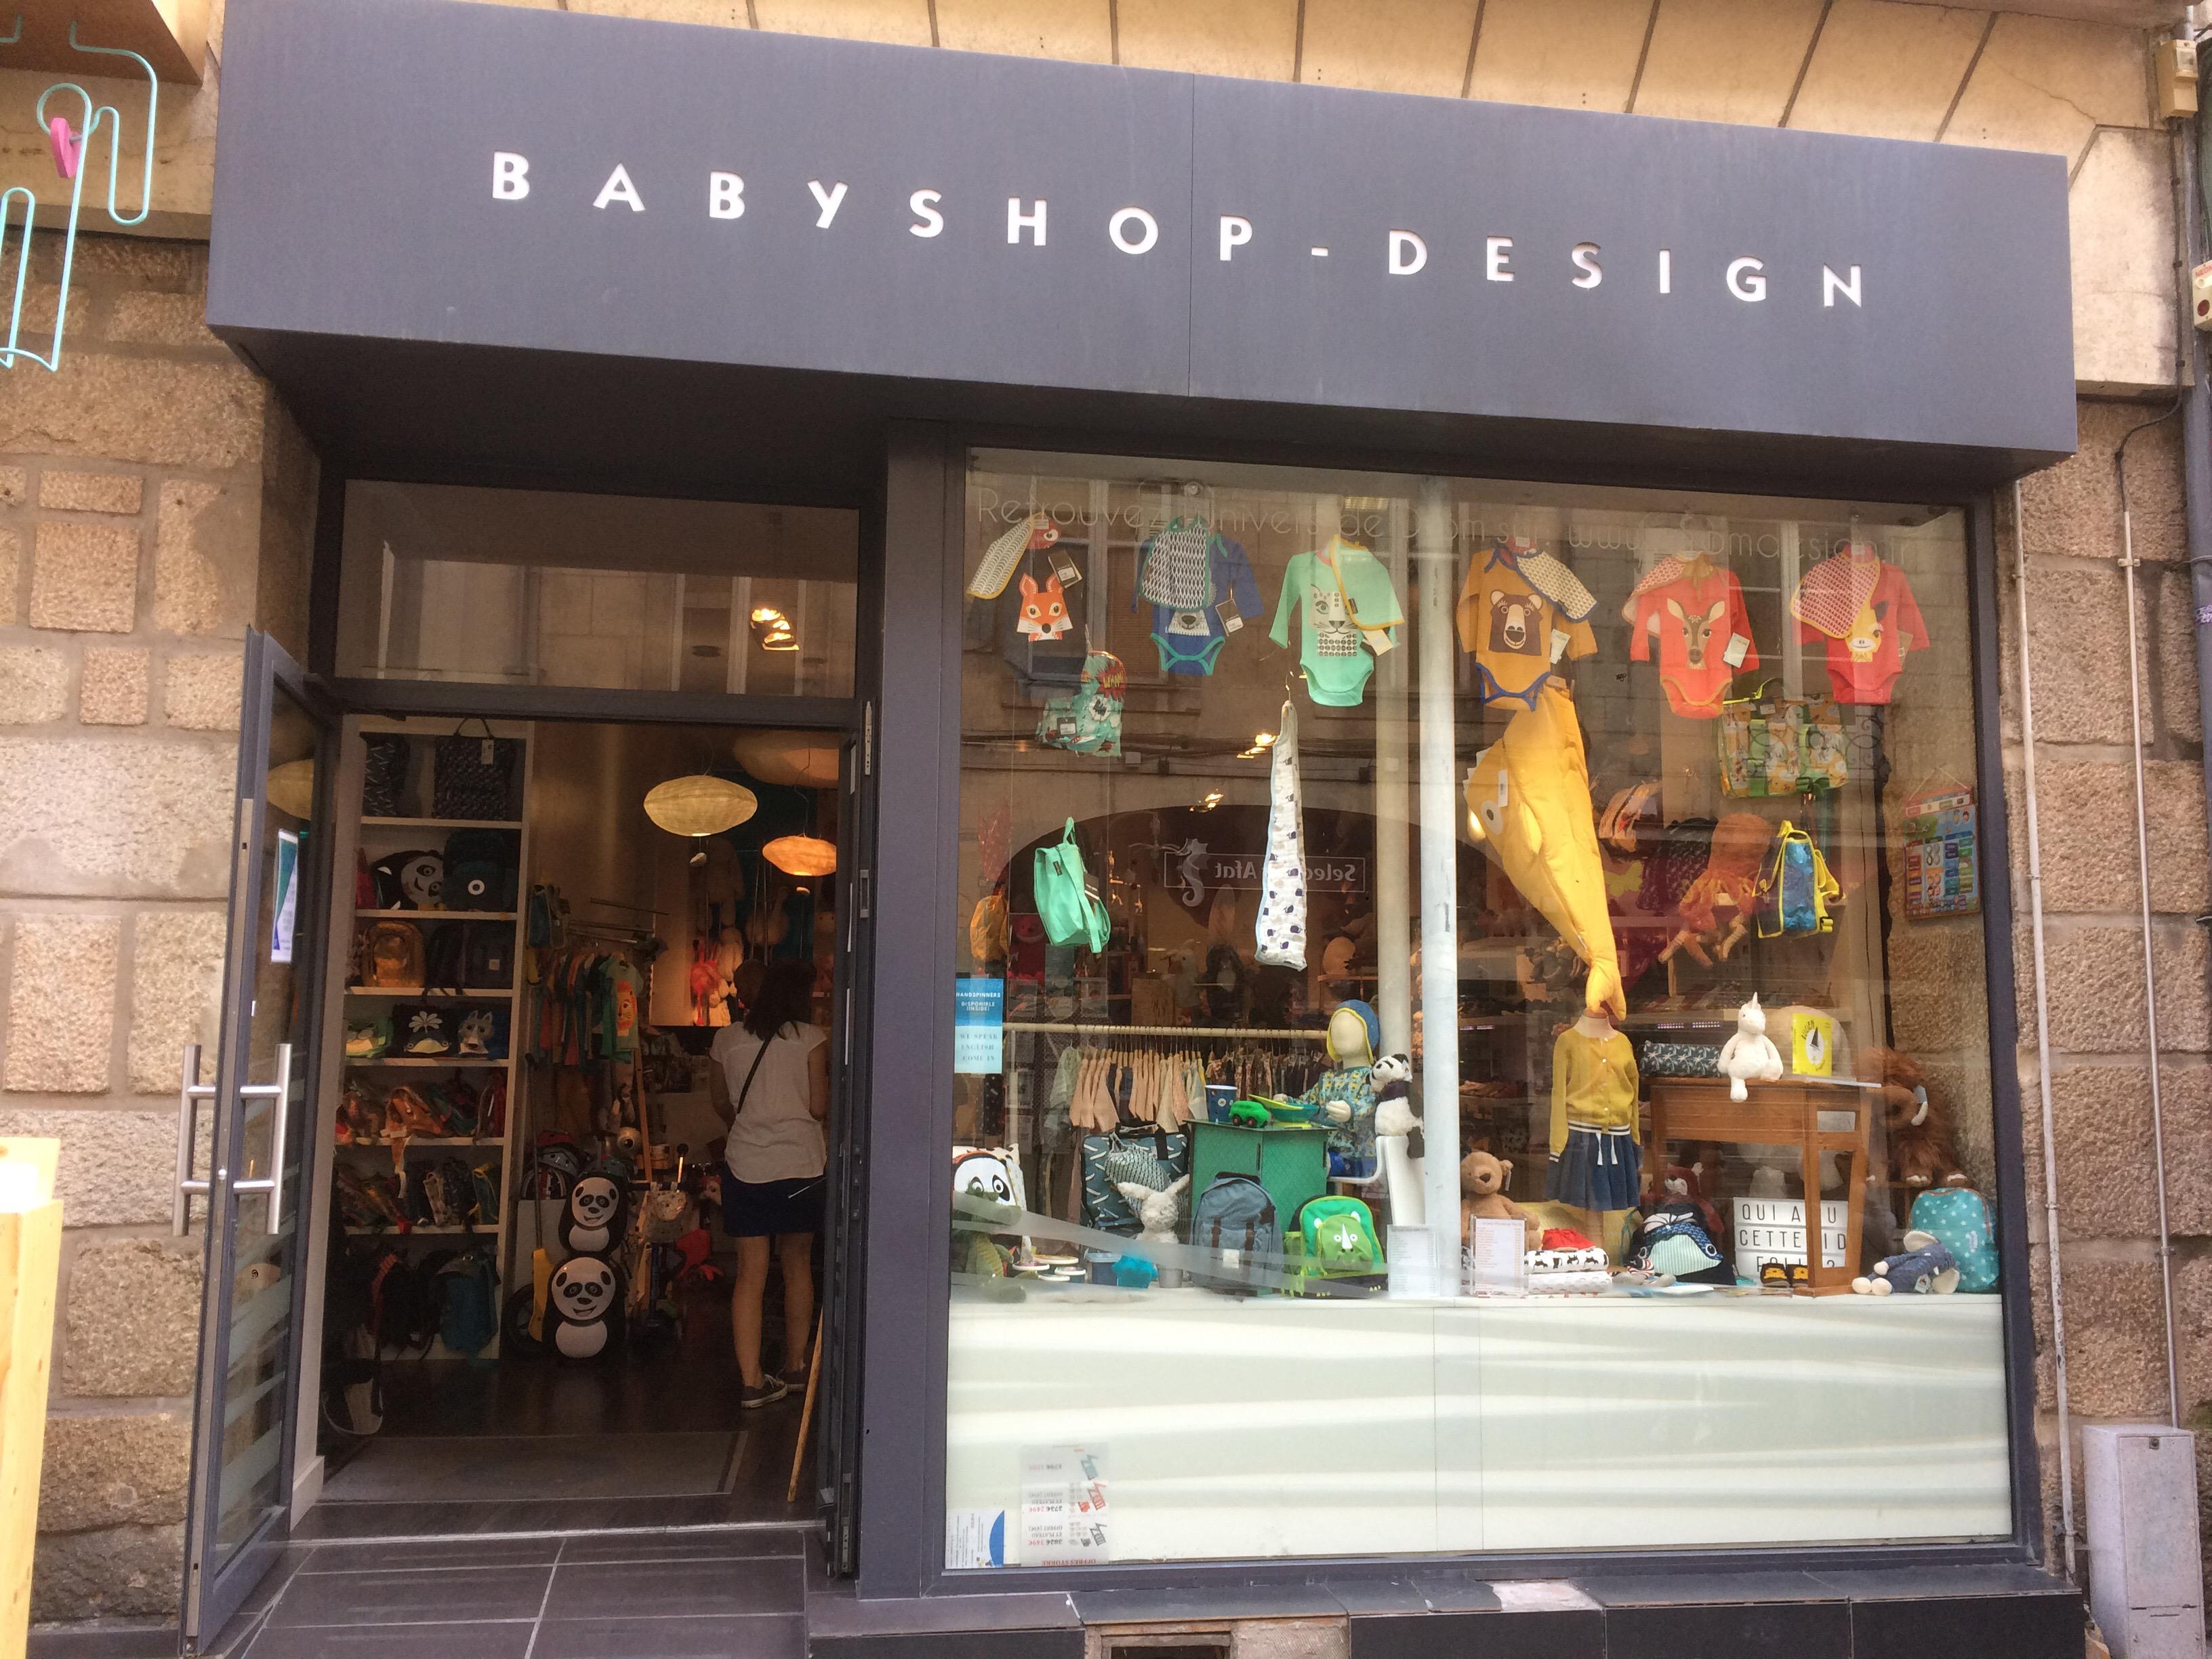 Dröm nantes babyshop design